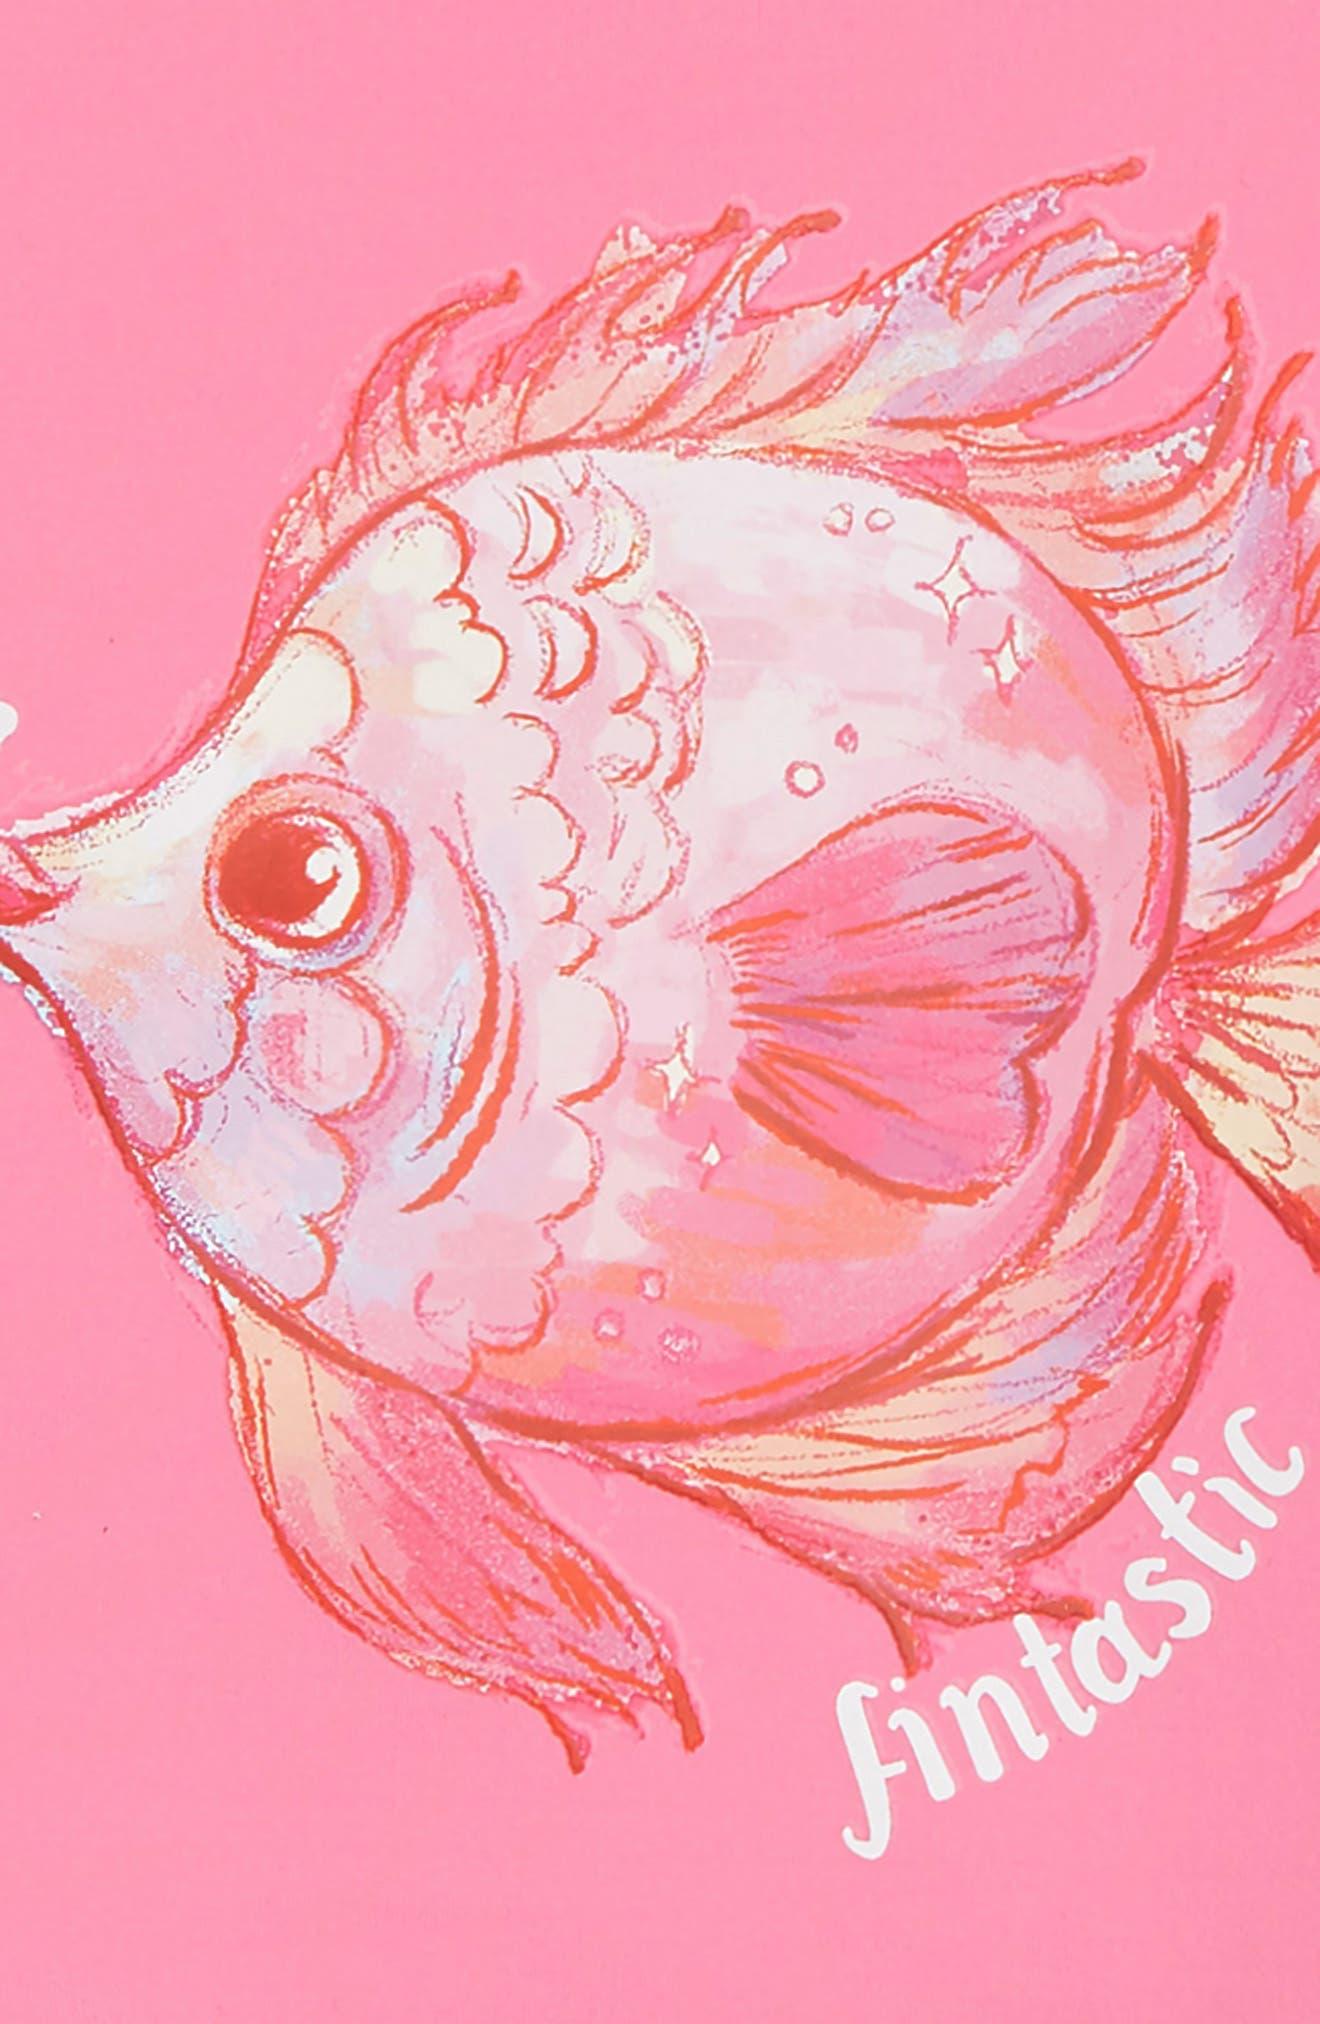 HATLEY, Watercolor Fishies Two-Piece Rashguard Swimsuit, Alternate thumbnail 2, color, PINK